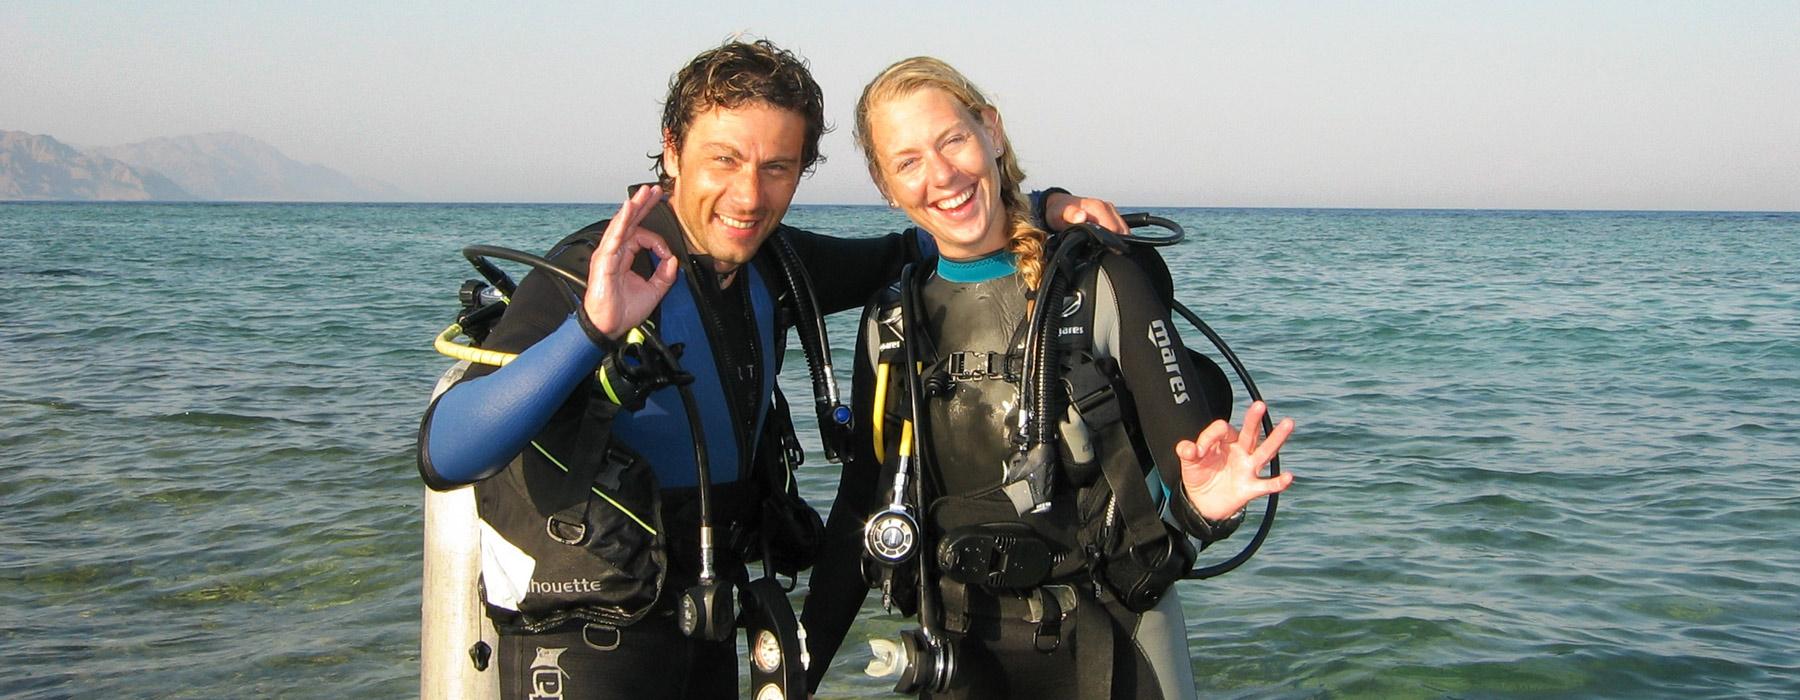 diving-in-dahab-annette-olivier